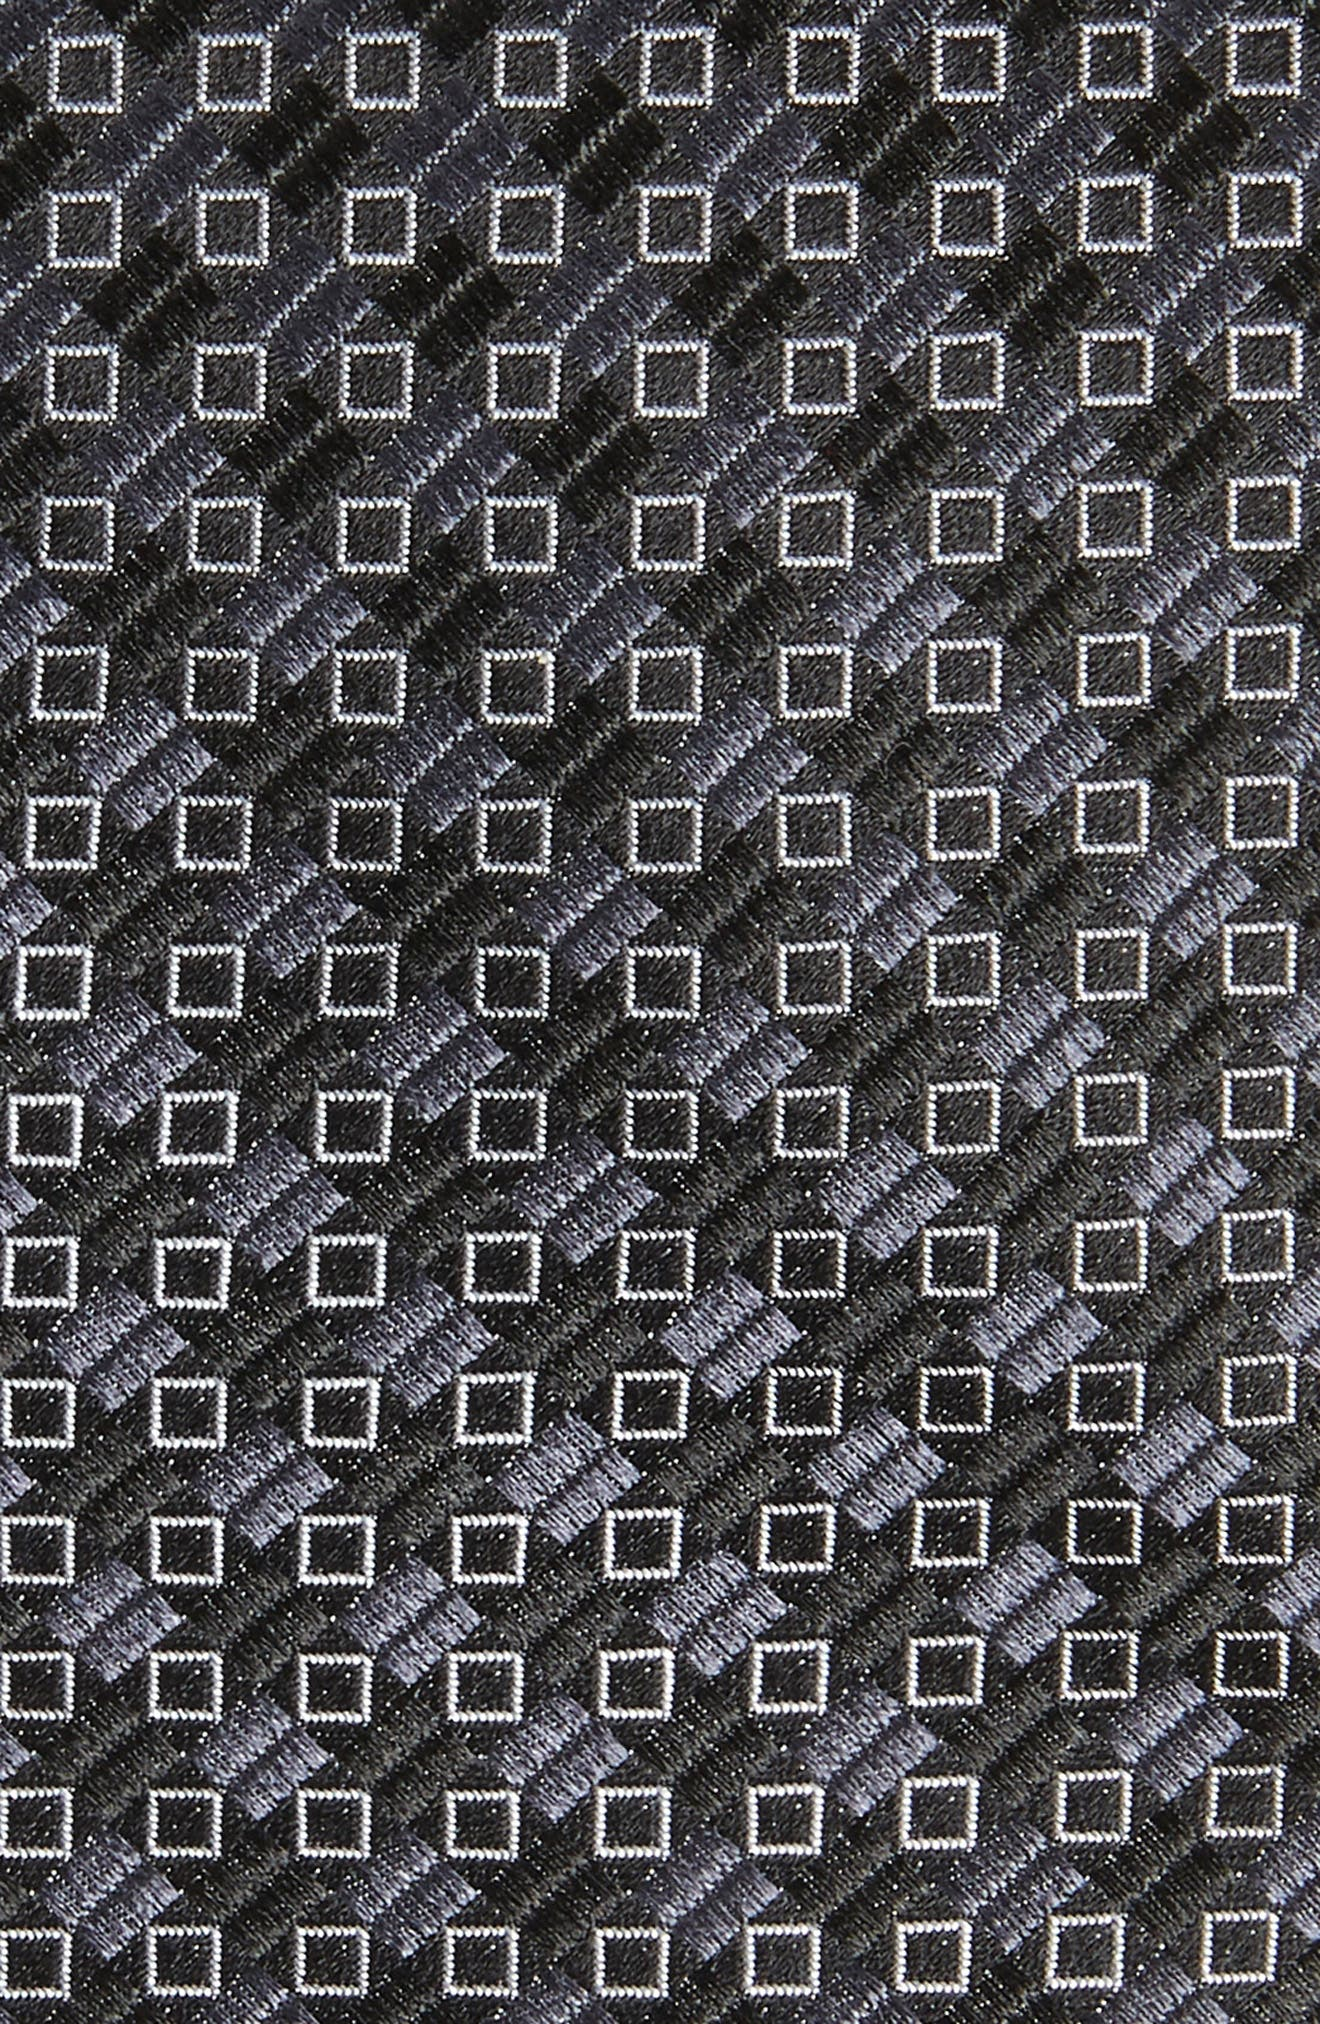 Middletown Geometric Silk Tie,                             Alternate thumbnail 2, color,                             001